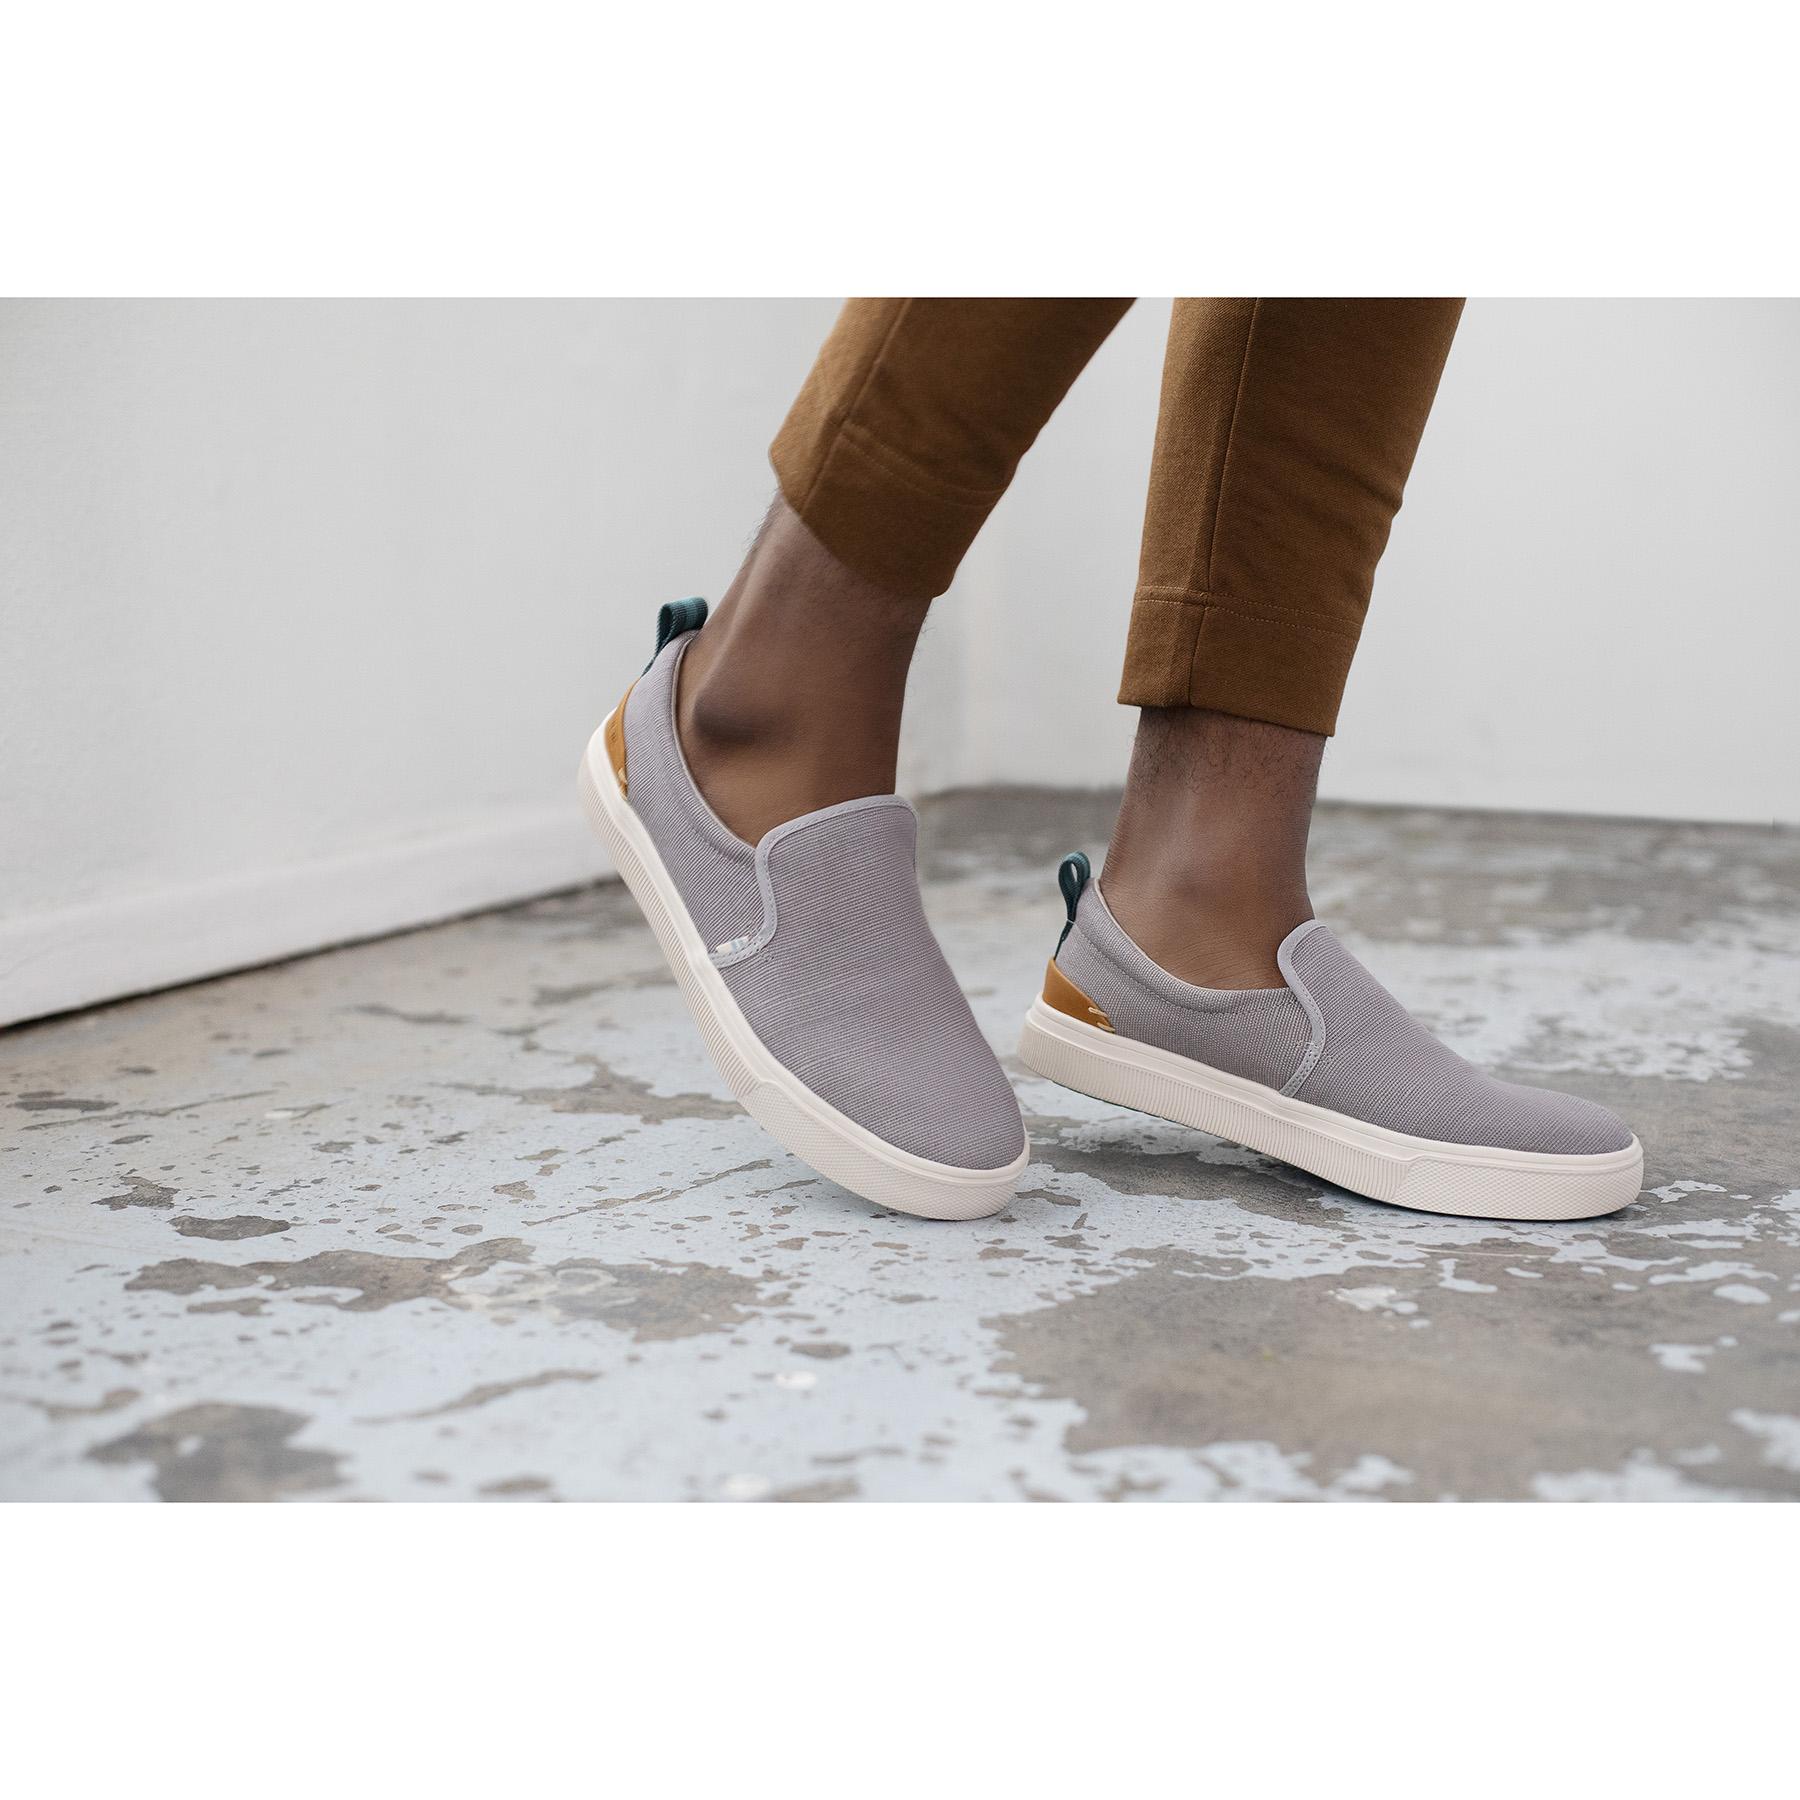 Toms Trvl Lite Slip On Shoes available